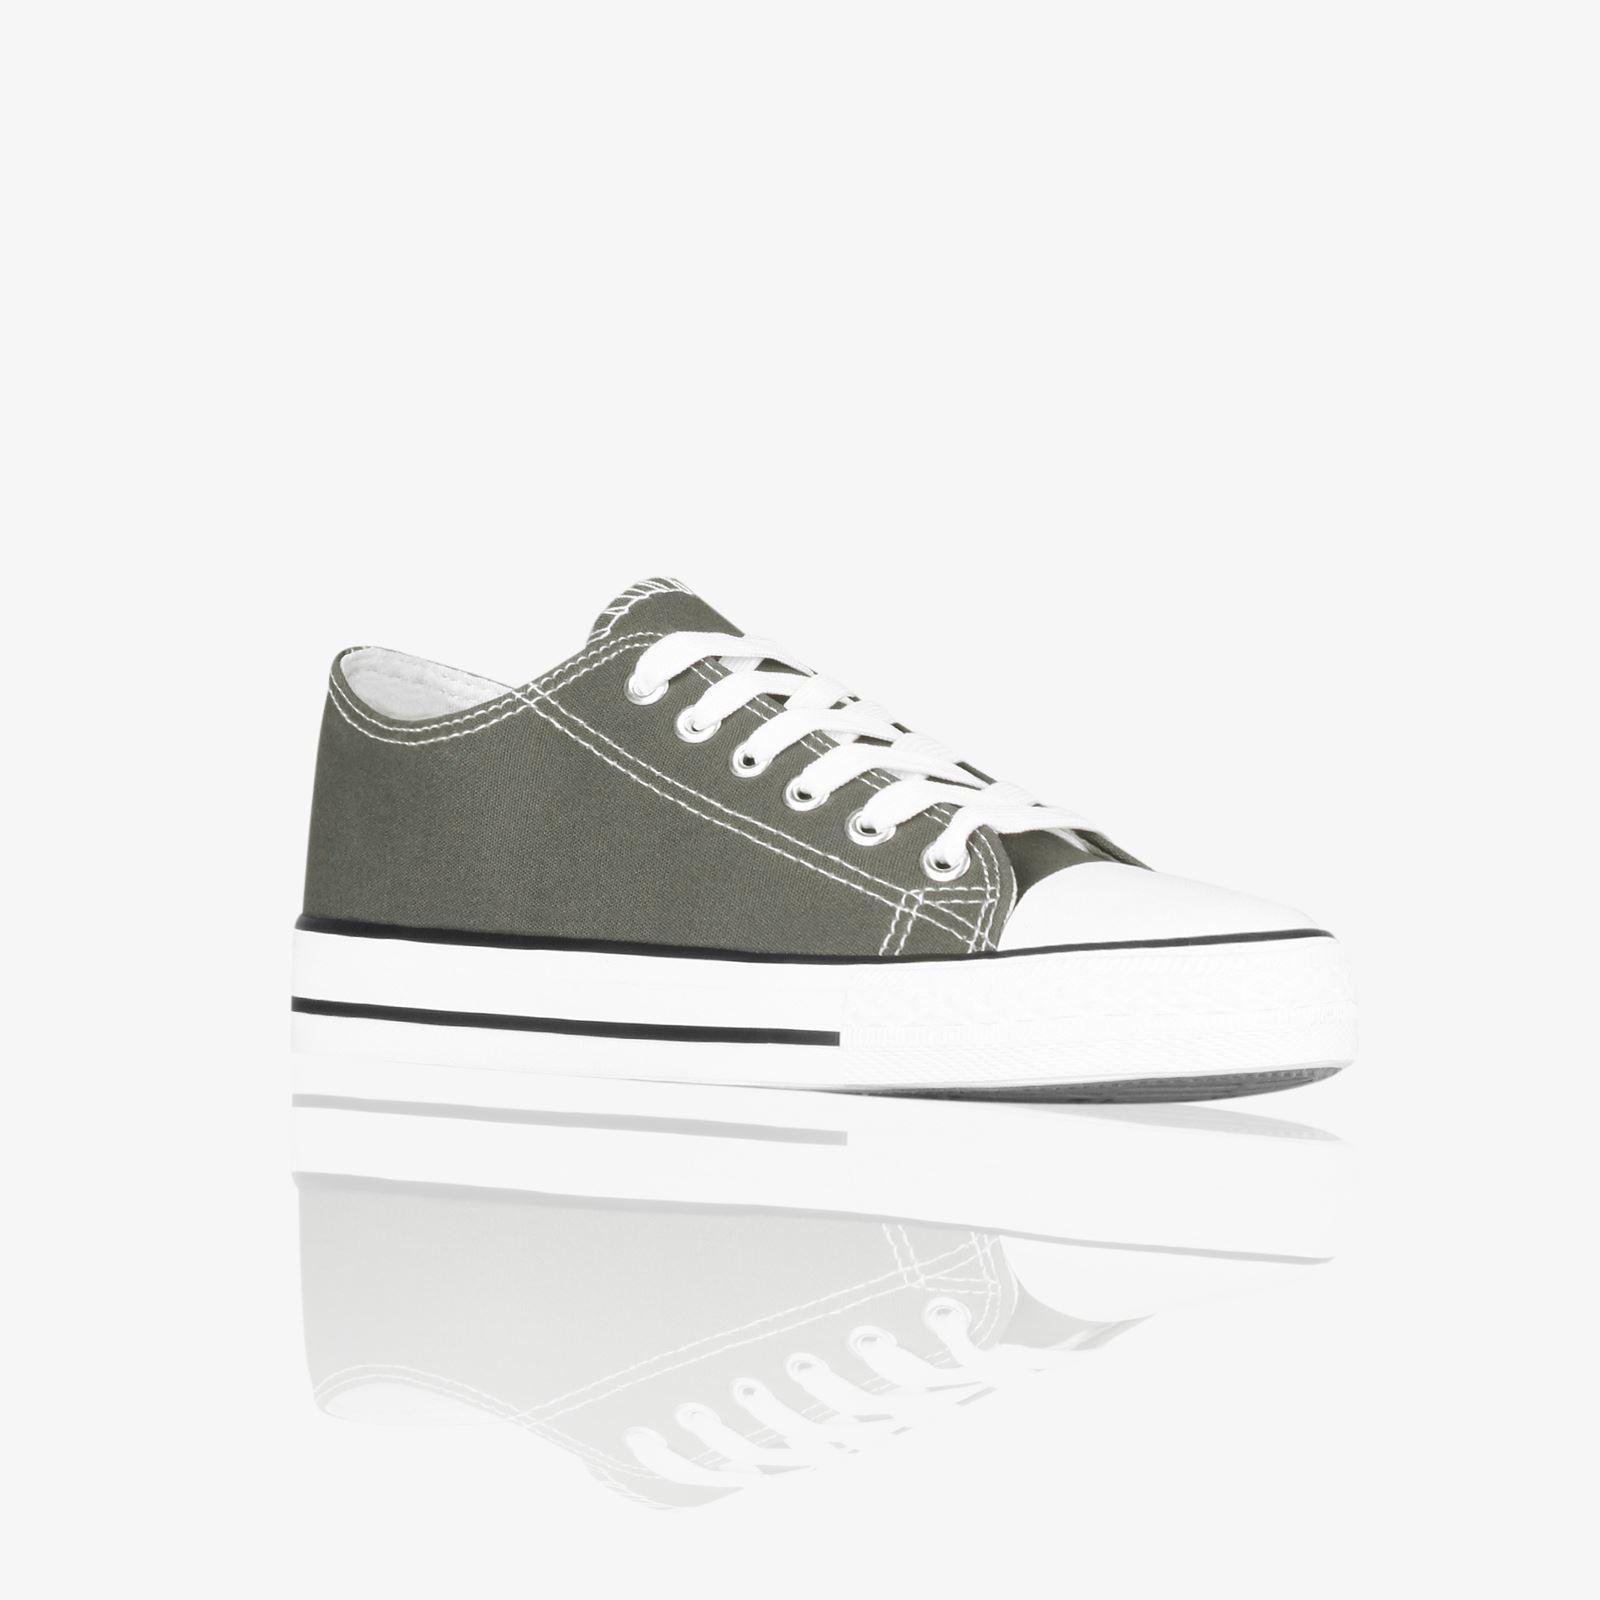 Zapatillas-Mujer-Casuales-Deportiva-Barata-Lona-Moda-Originales-Outlet-Tela-Moda miniatura 19